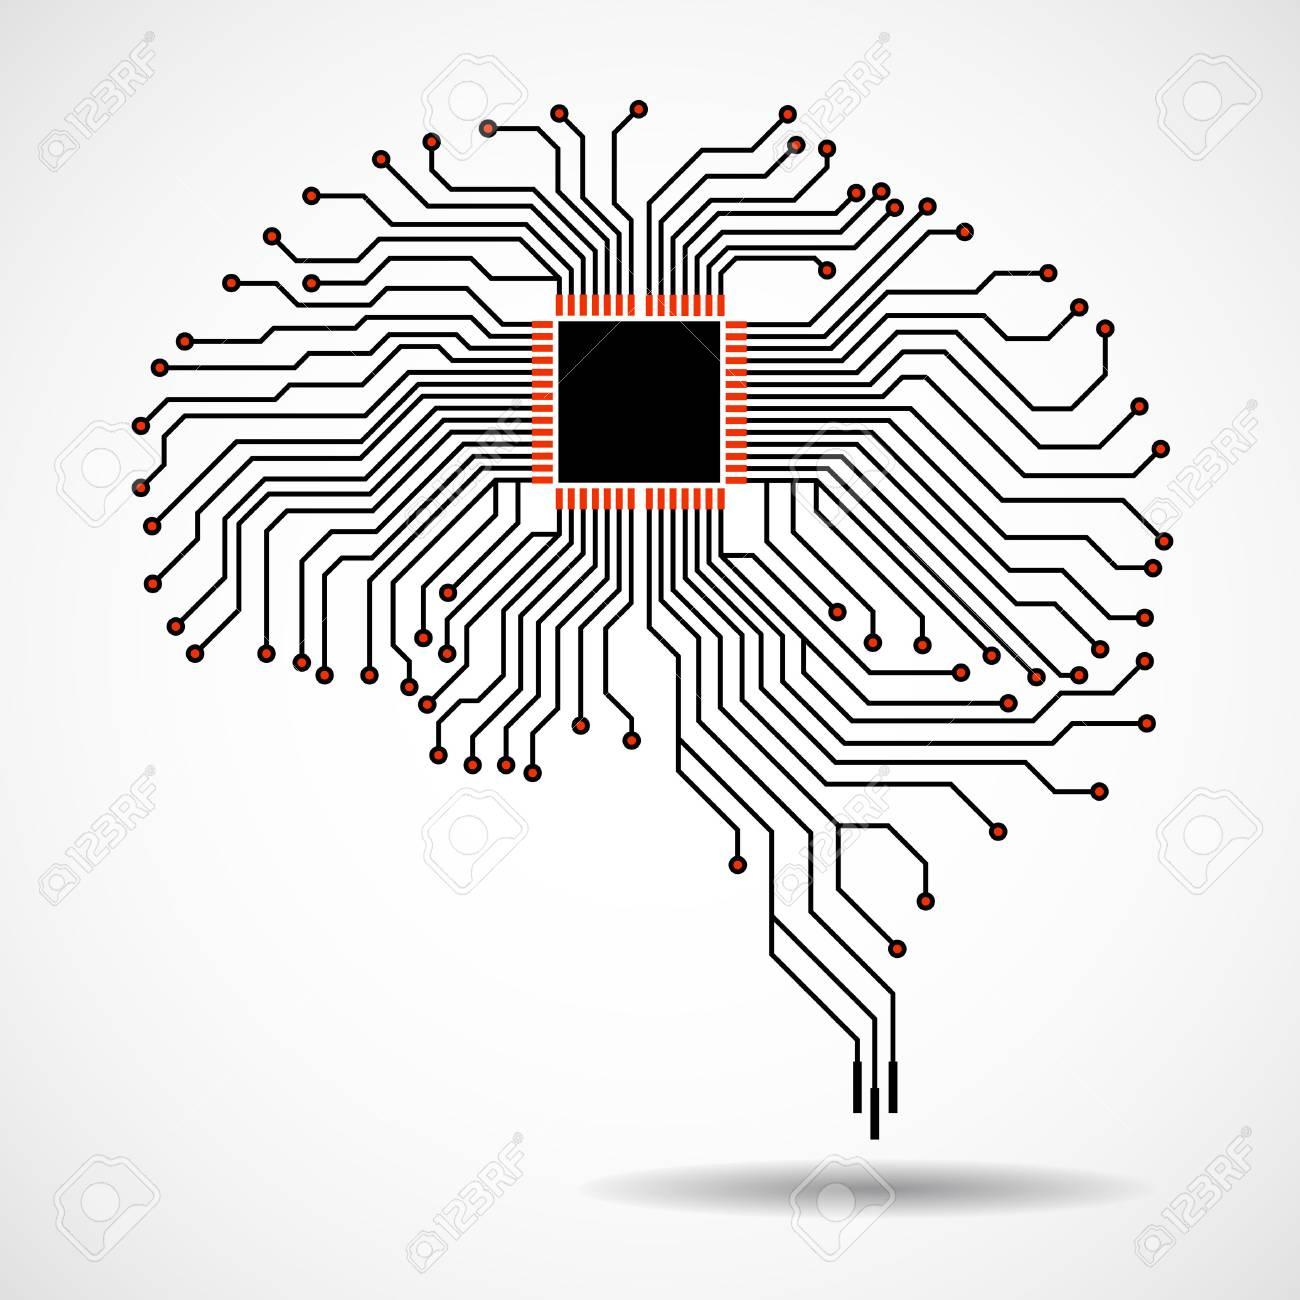 Abstract Technological Brain. Cpu. Circuit Board. Vector Royalty ...